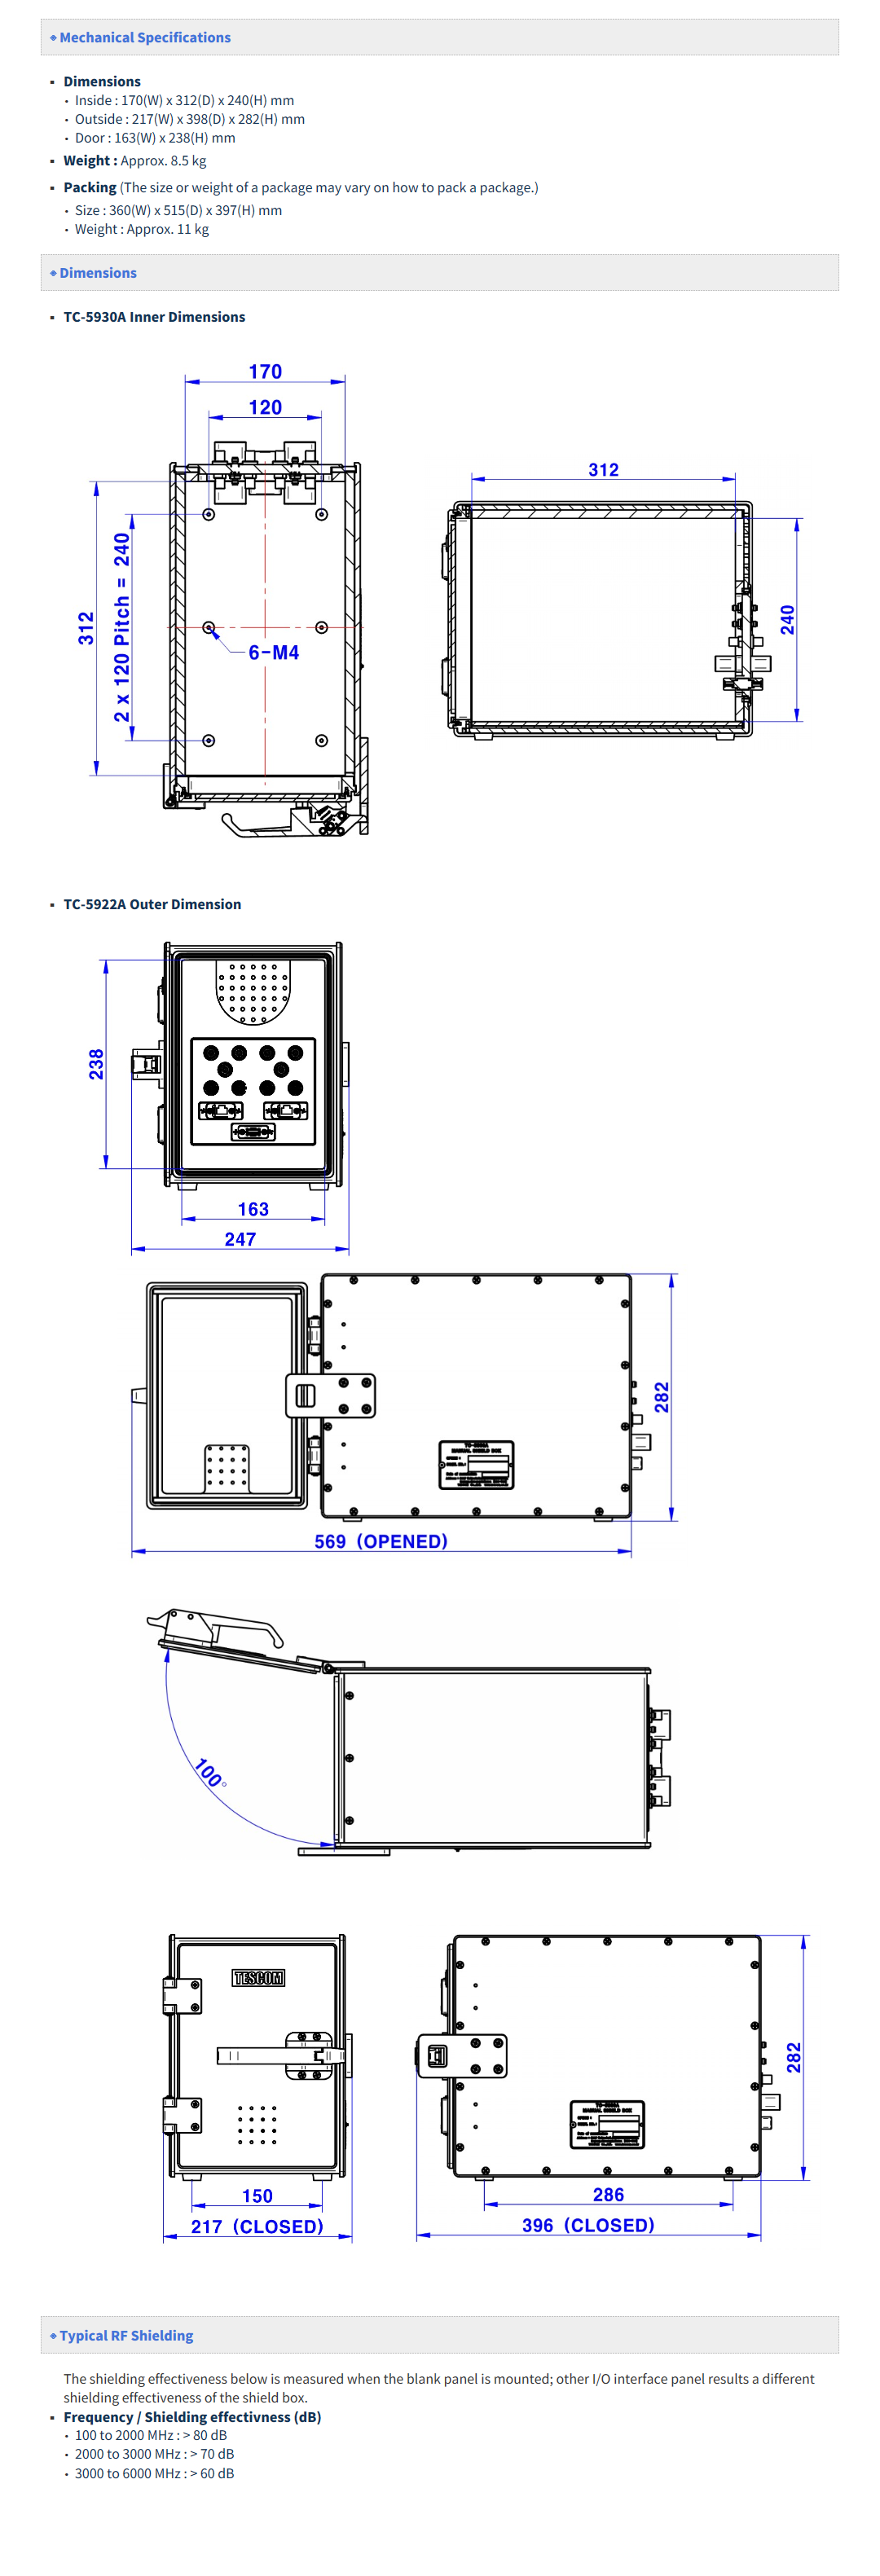 Tescom Manual Operation TC-5930A/AR 1